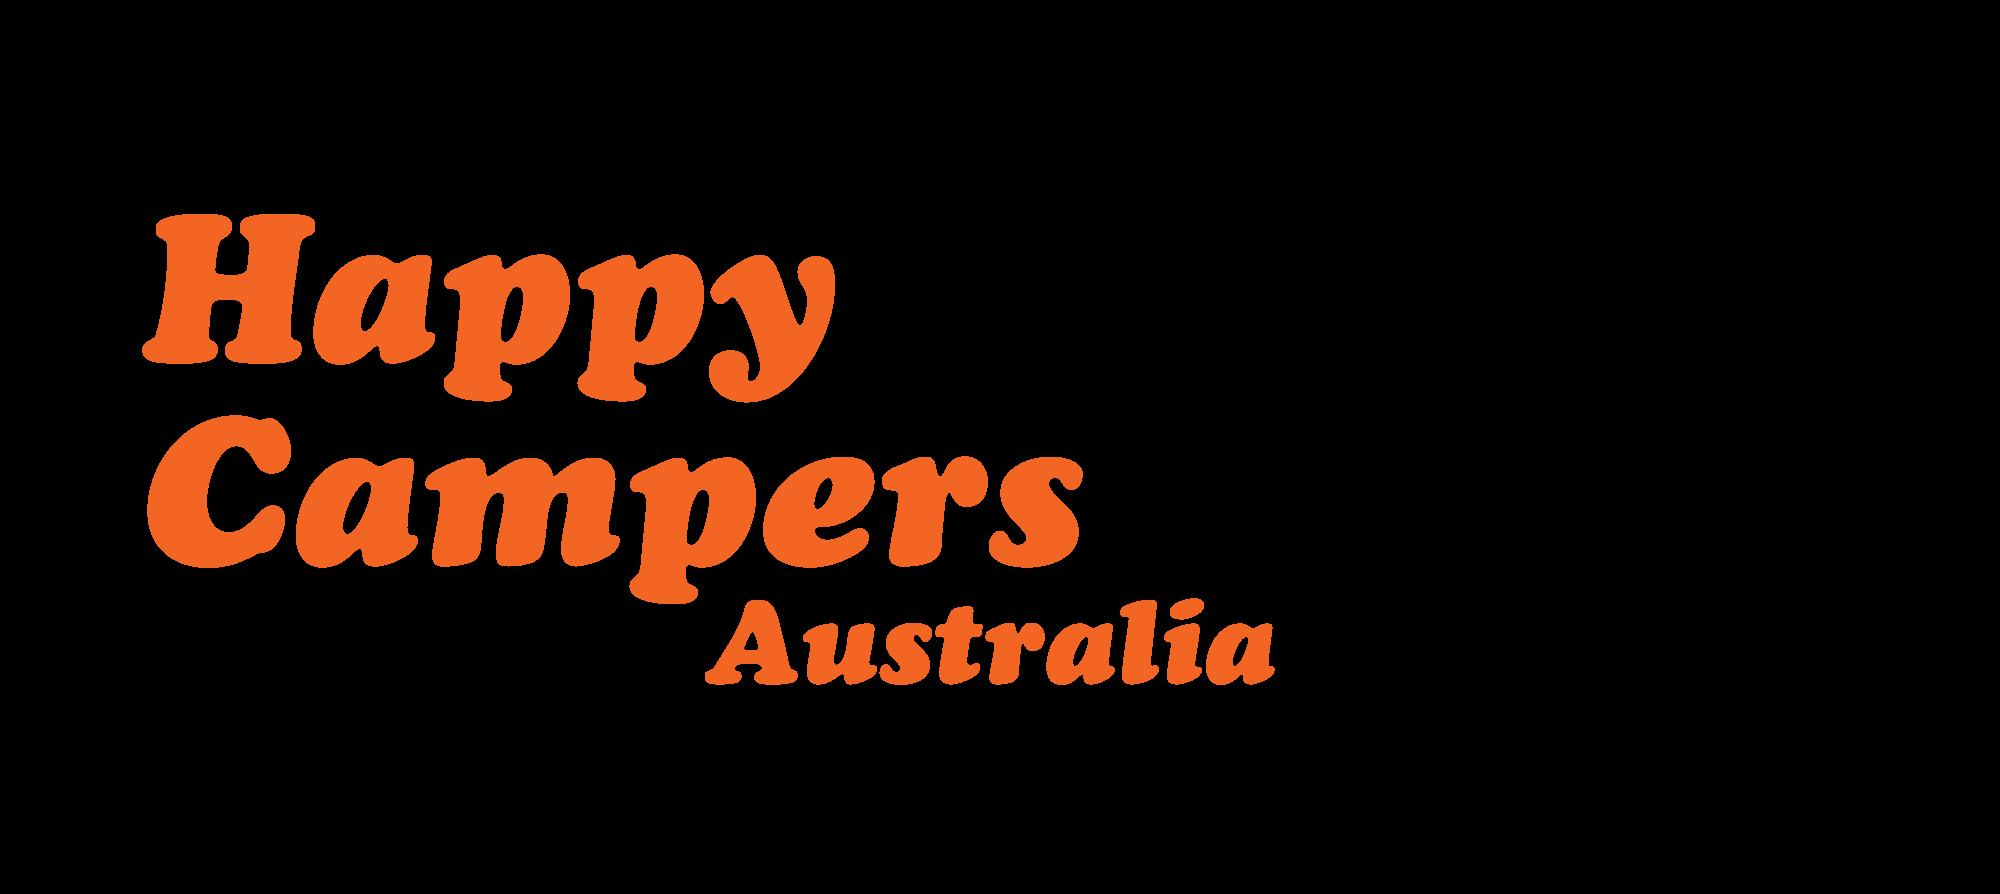 Happy Campers Australia